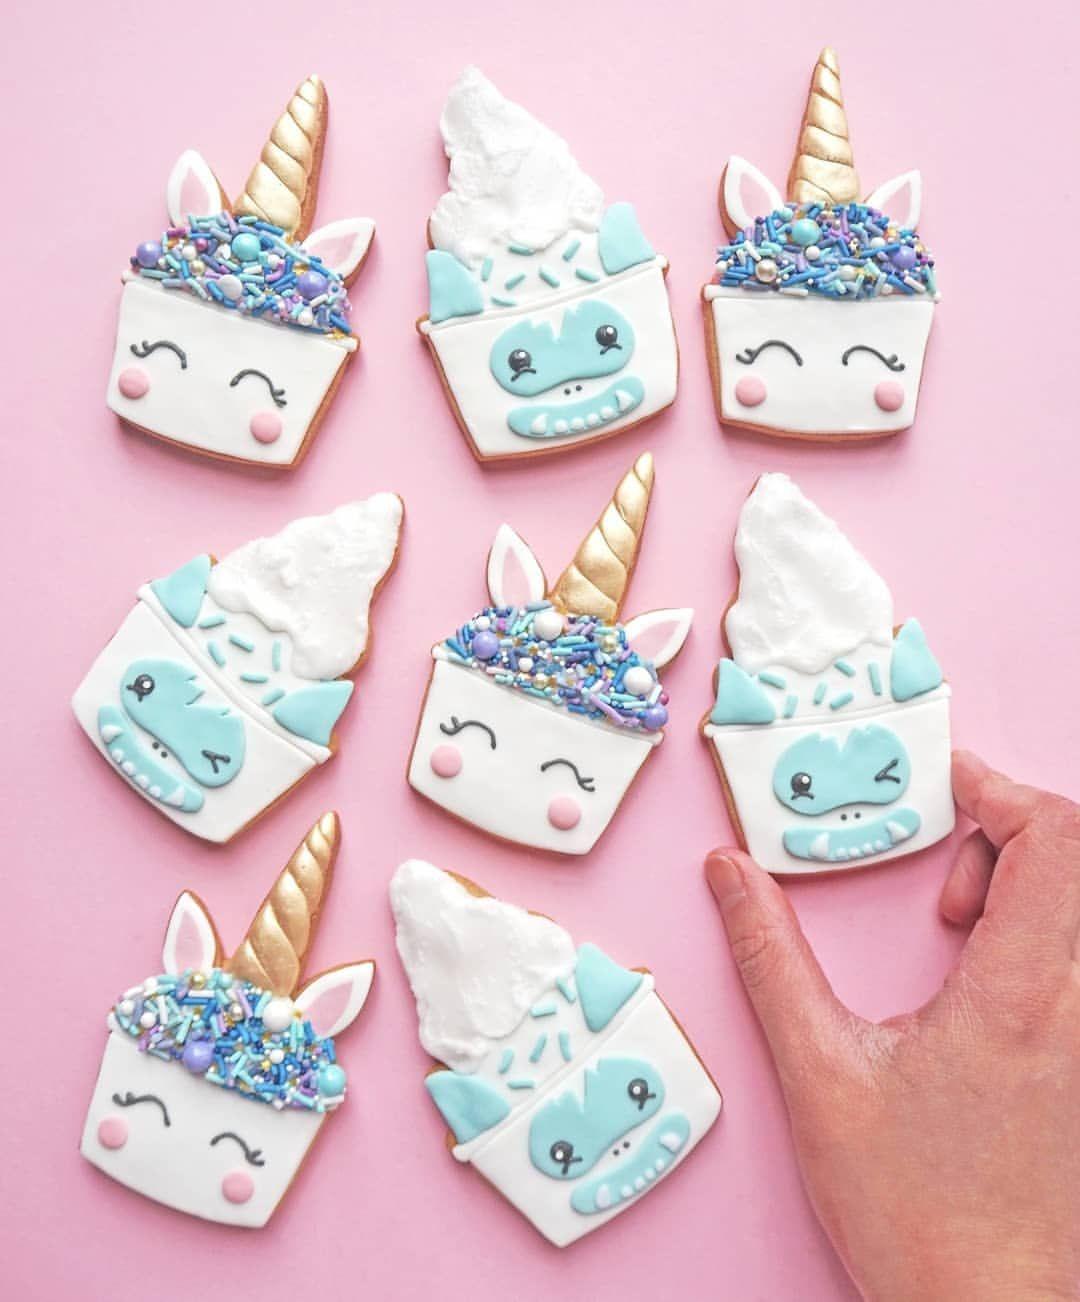 17+ Baskin robbins unicorn cake order trends